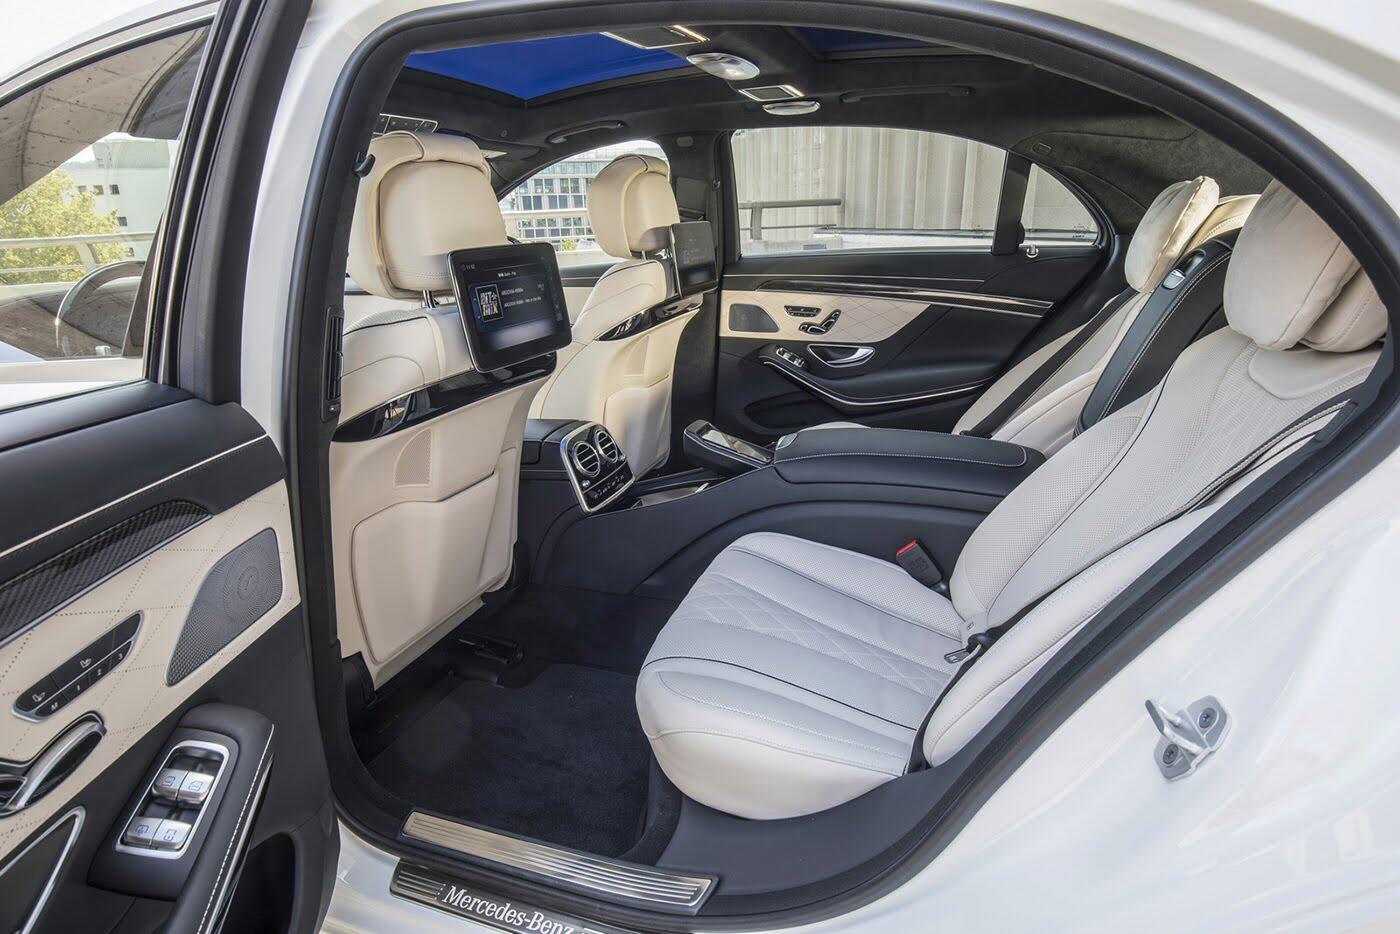 Ảnh chi tiết Mercedes-Benz S-Class 2018 - Hình 41